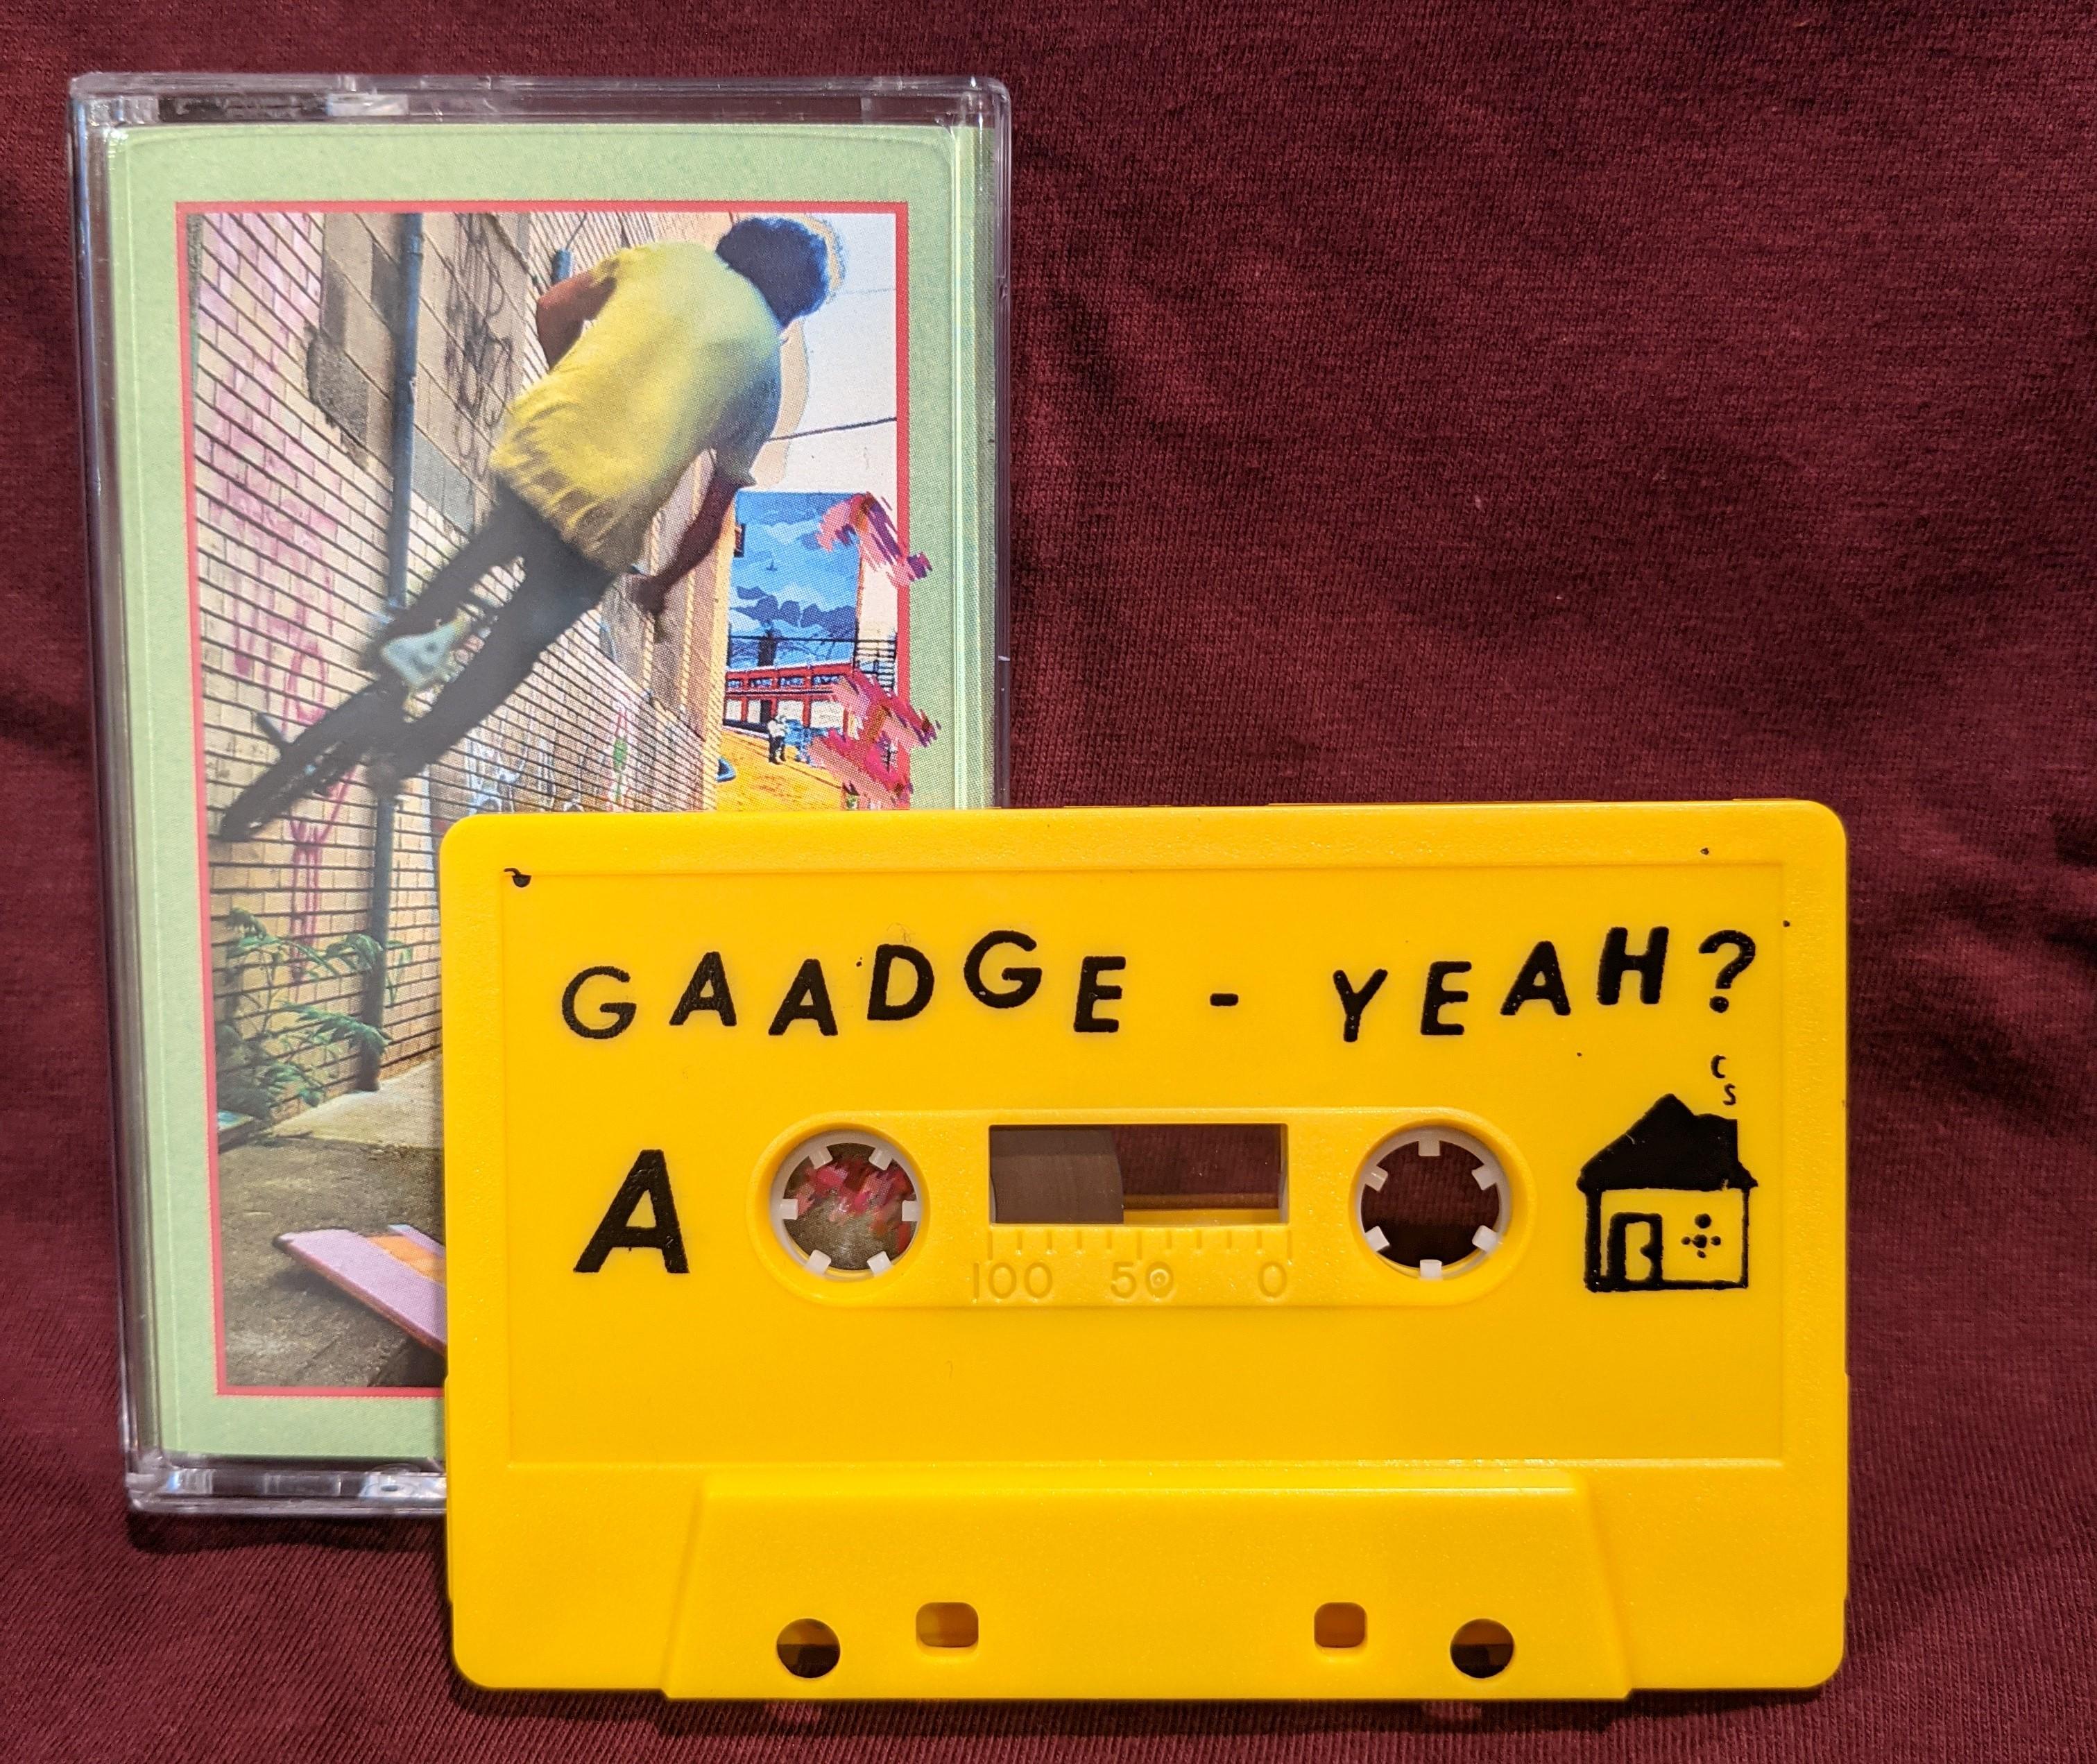 DISTRO - Gaadge - Yeah?